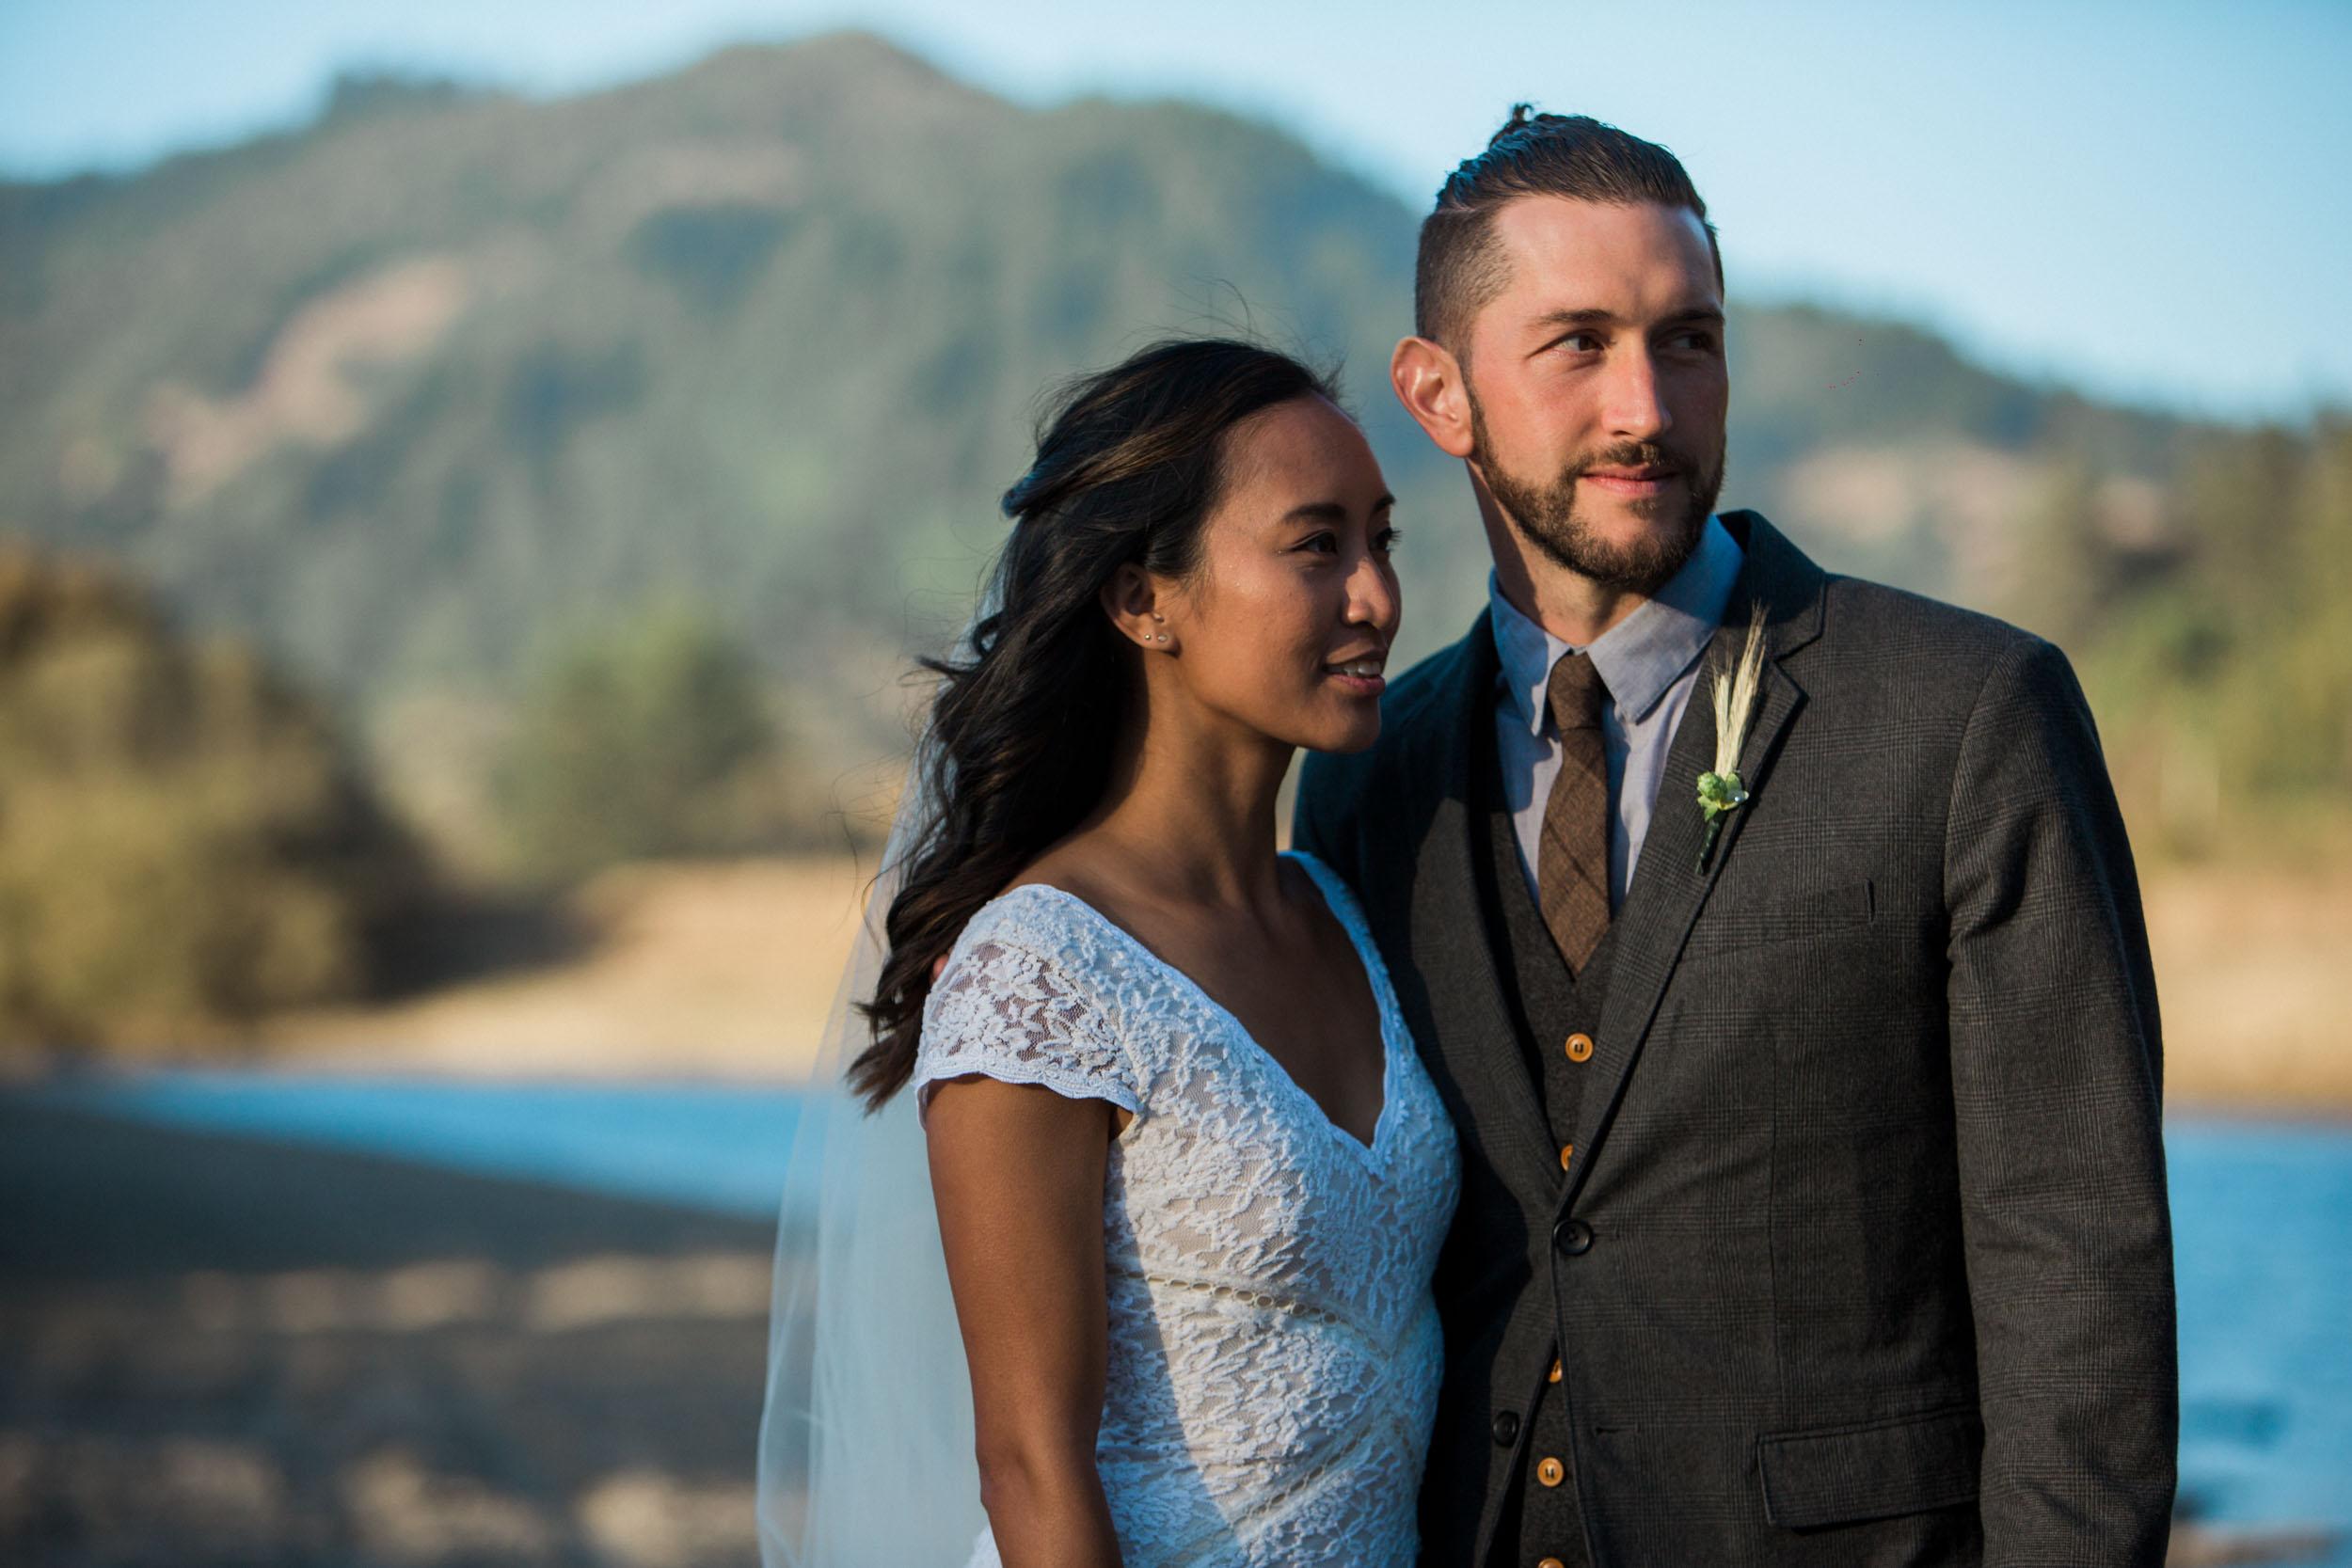 BKM-Photography-Russian-River-Wedding-Redwoods-Guerneville-California-Destination-Wedding-Photographer-0101.jpg